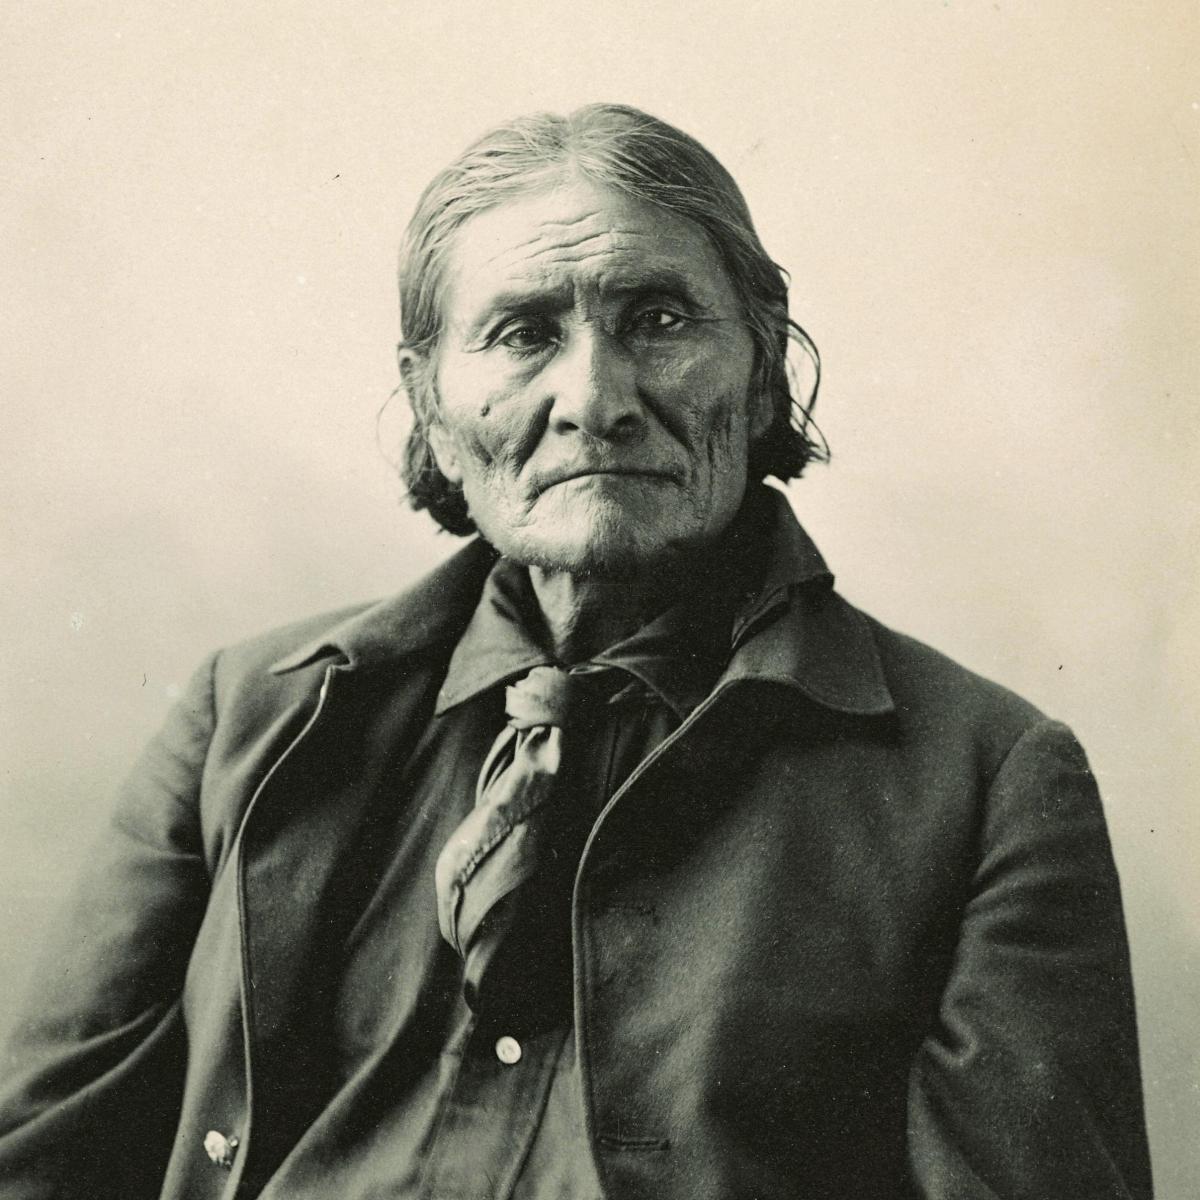 Sheppard – Geronimo